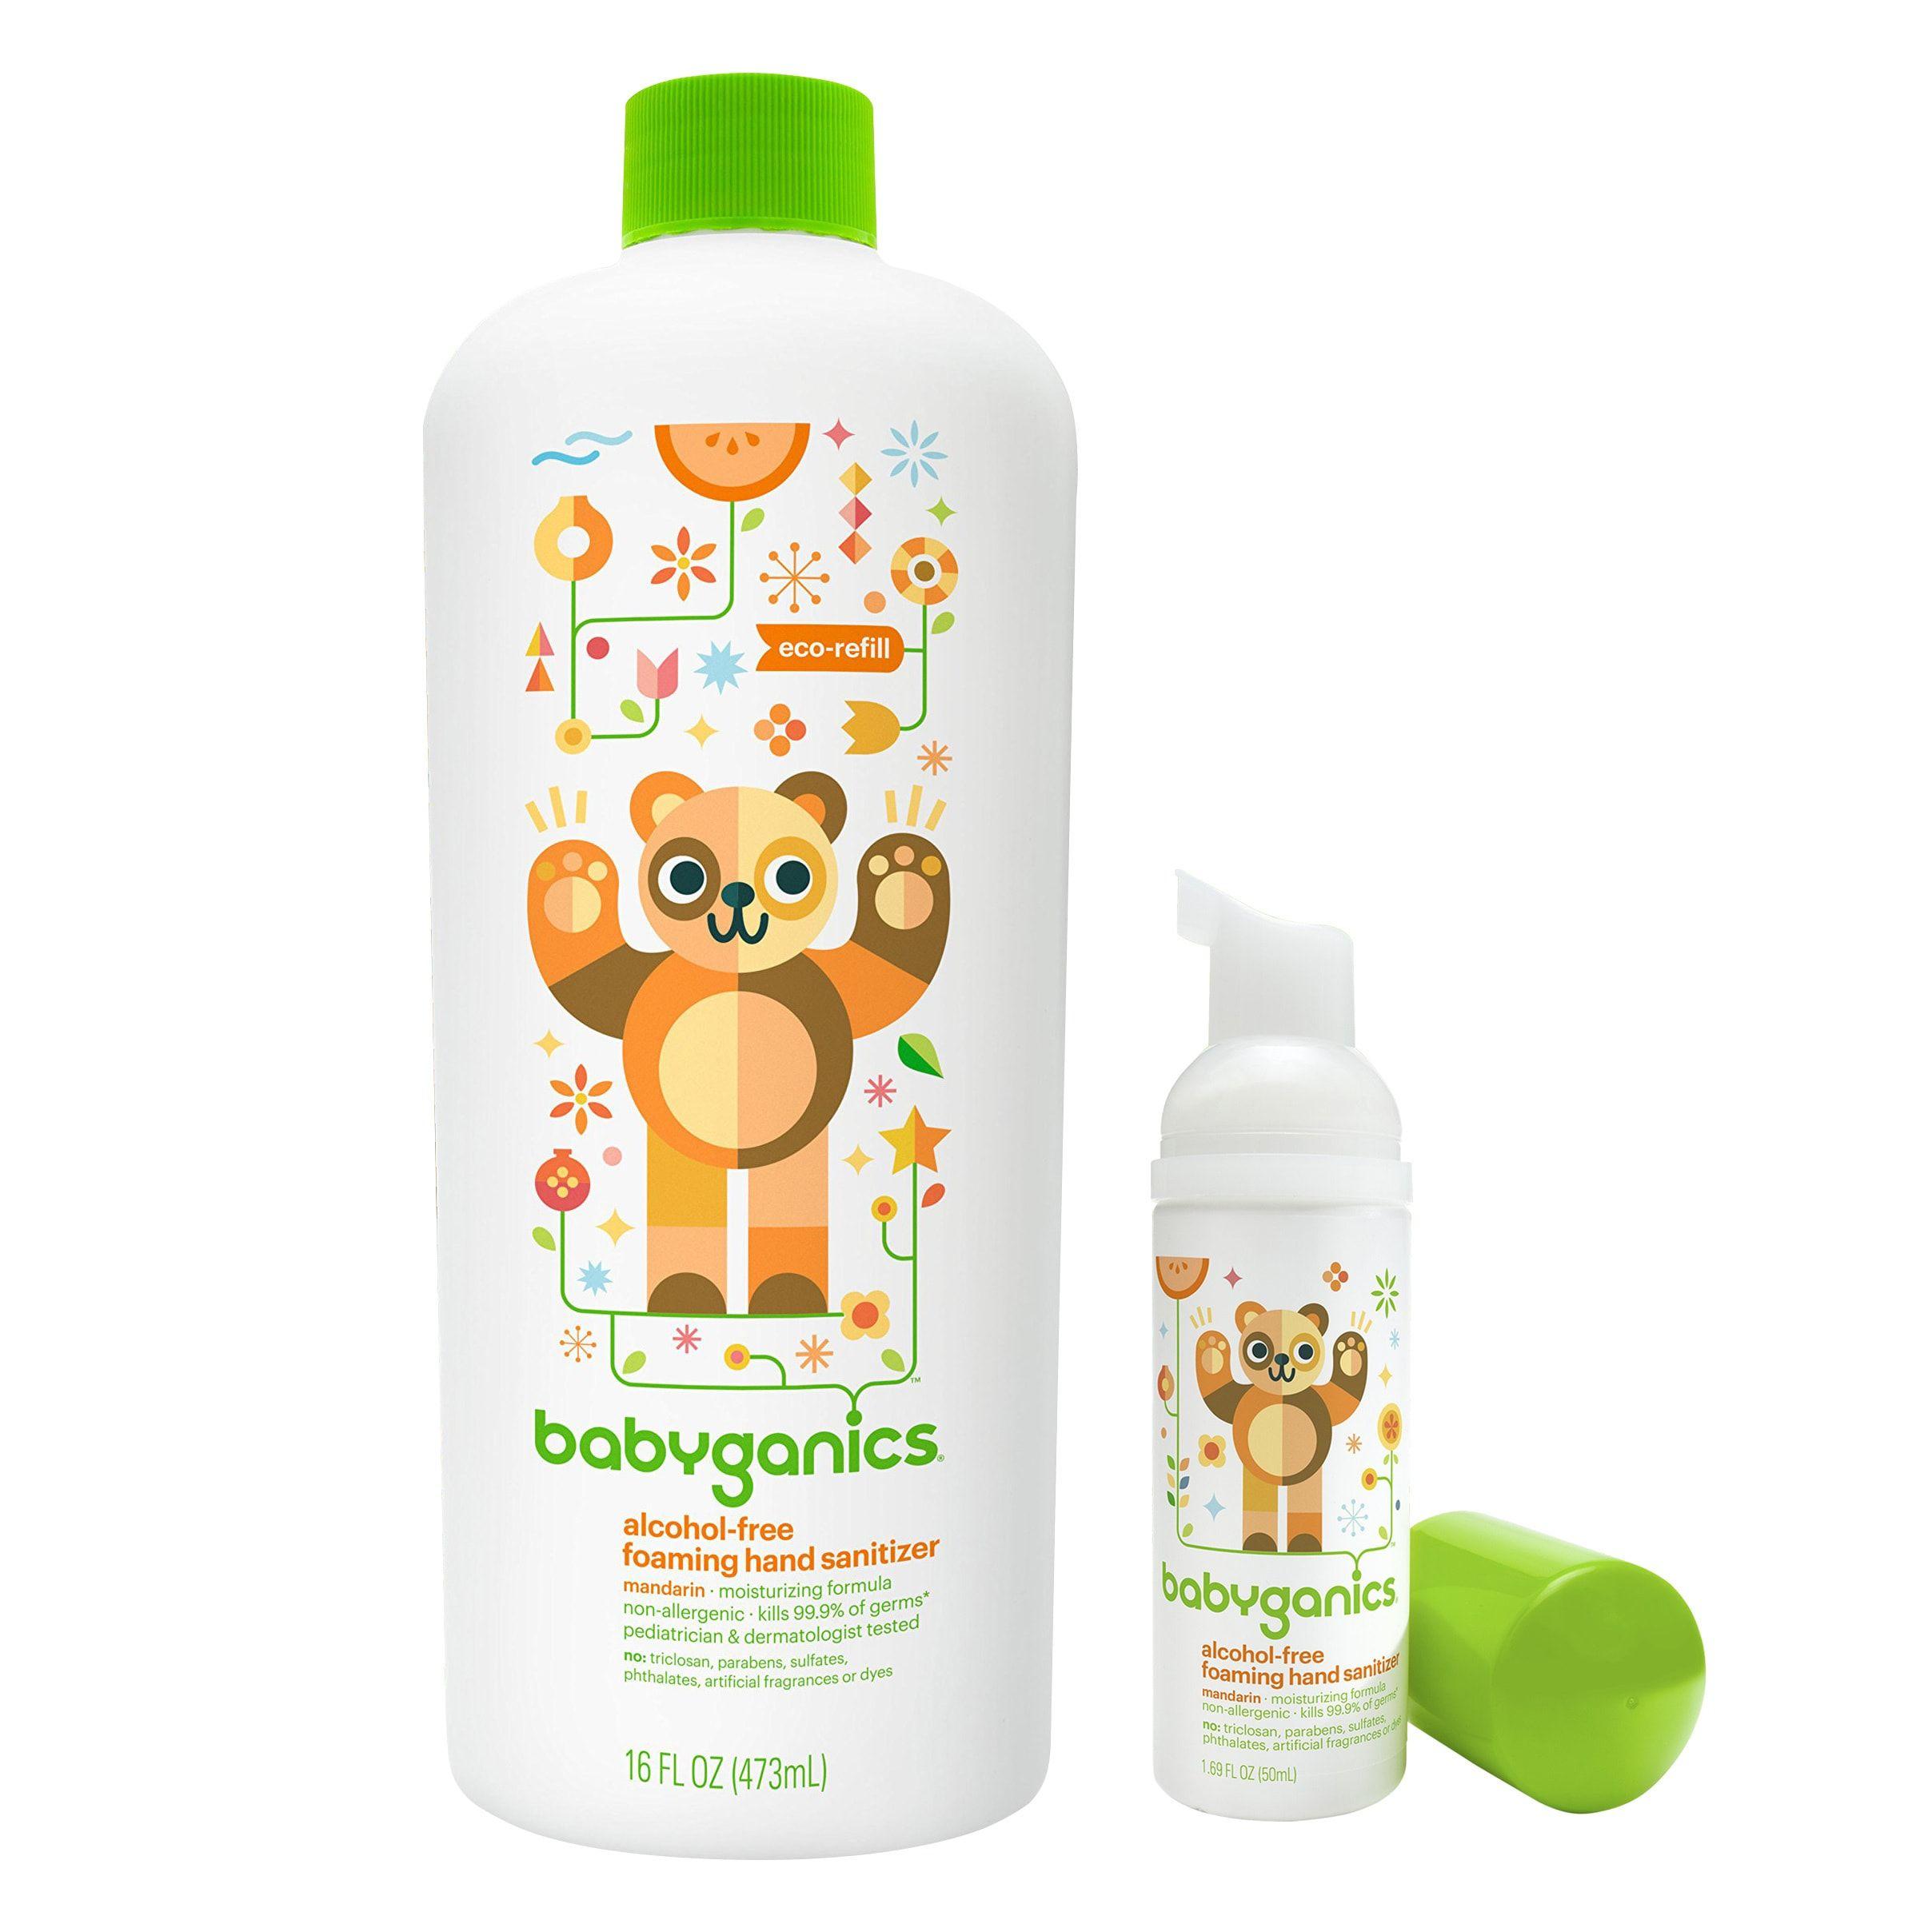 Babyganics 16 Oz Alcohol Free Foaming Hand Sanitizer Refill